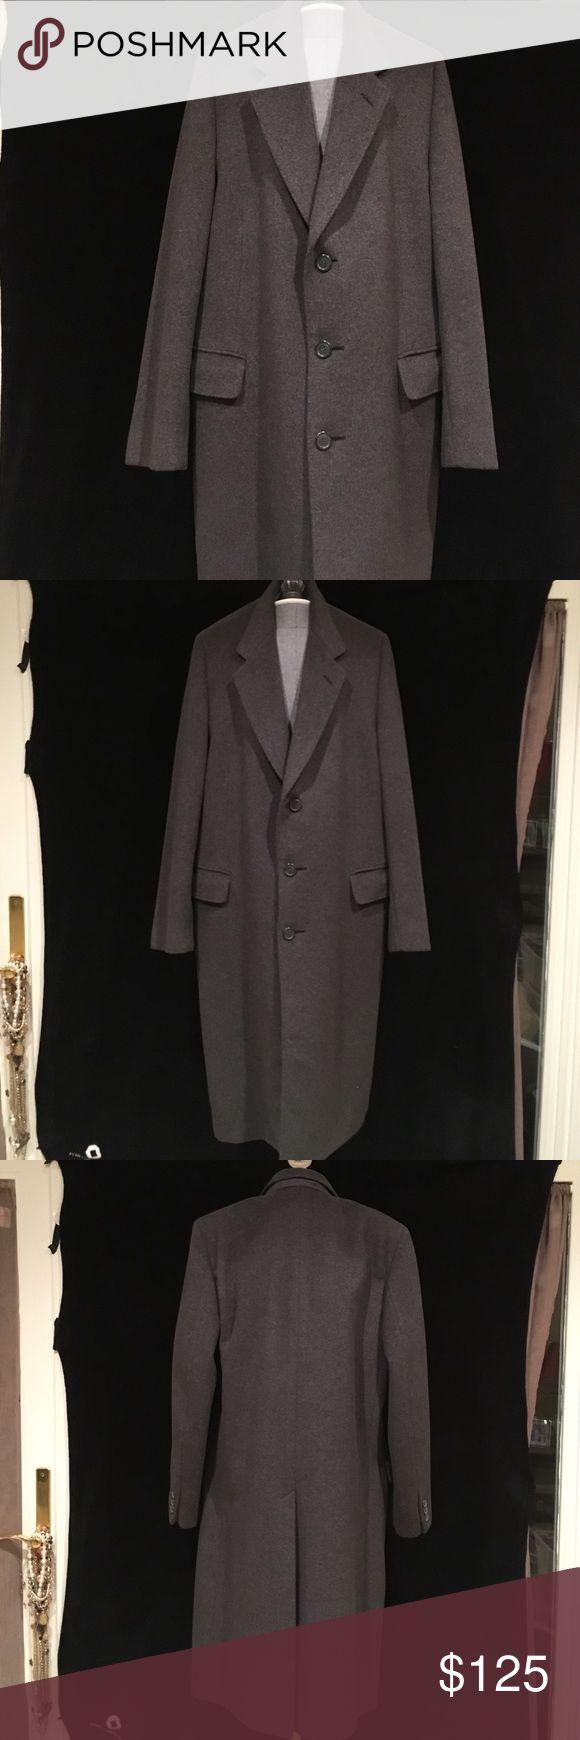 "NWOT! Ciatti Men's Long Overcoat in Sz 42 Regular. NWOT! Ciatti Men's Long Overcoat in Sz 42 Regular. Measures 45"" Long with 2 Front Pockets & 1 Breast Pocket. Wool Cashmere Blend. Silk Lining. Ciatti Jackets & Coats"